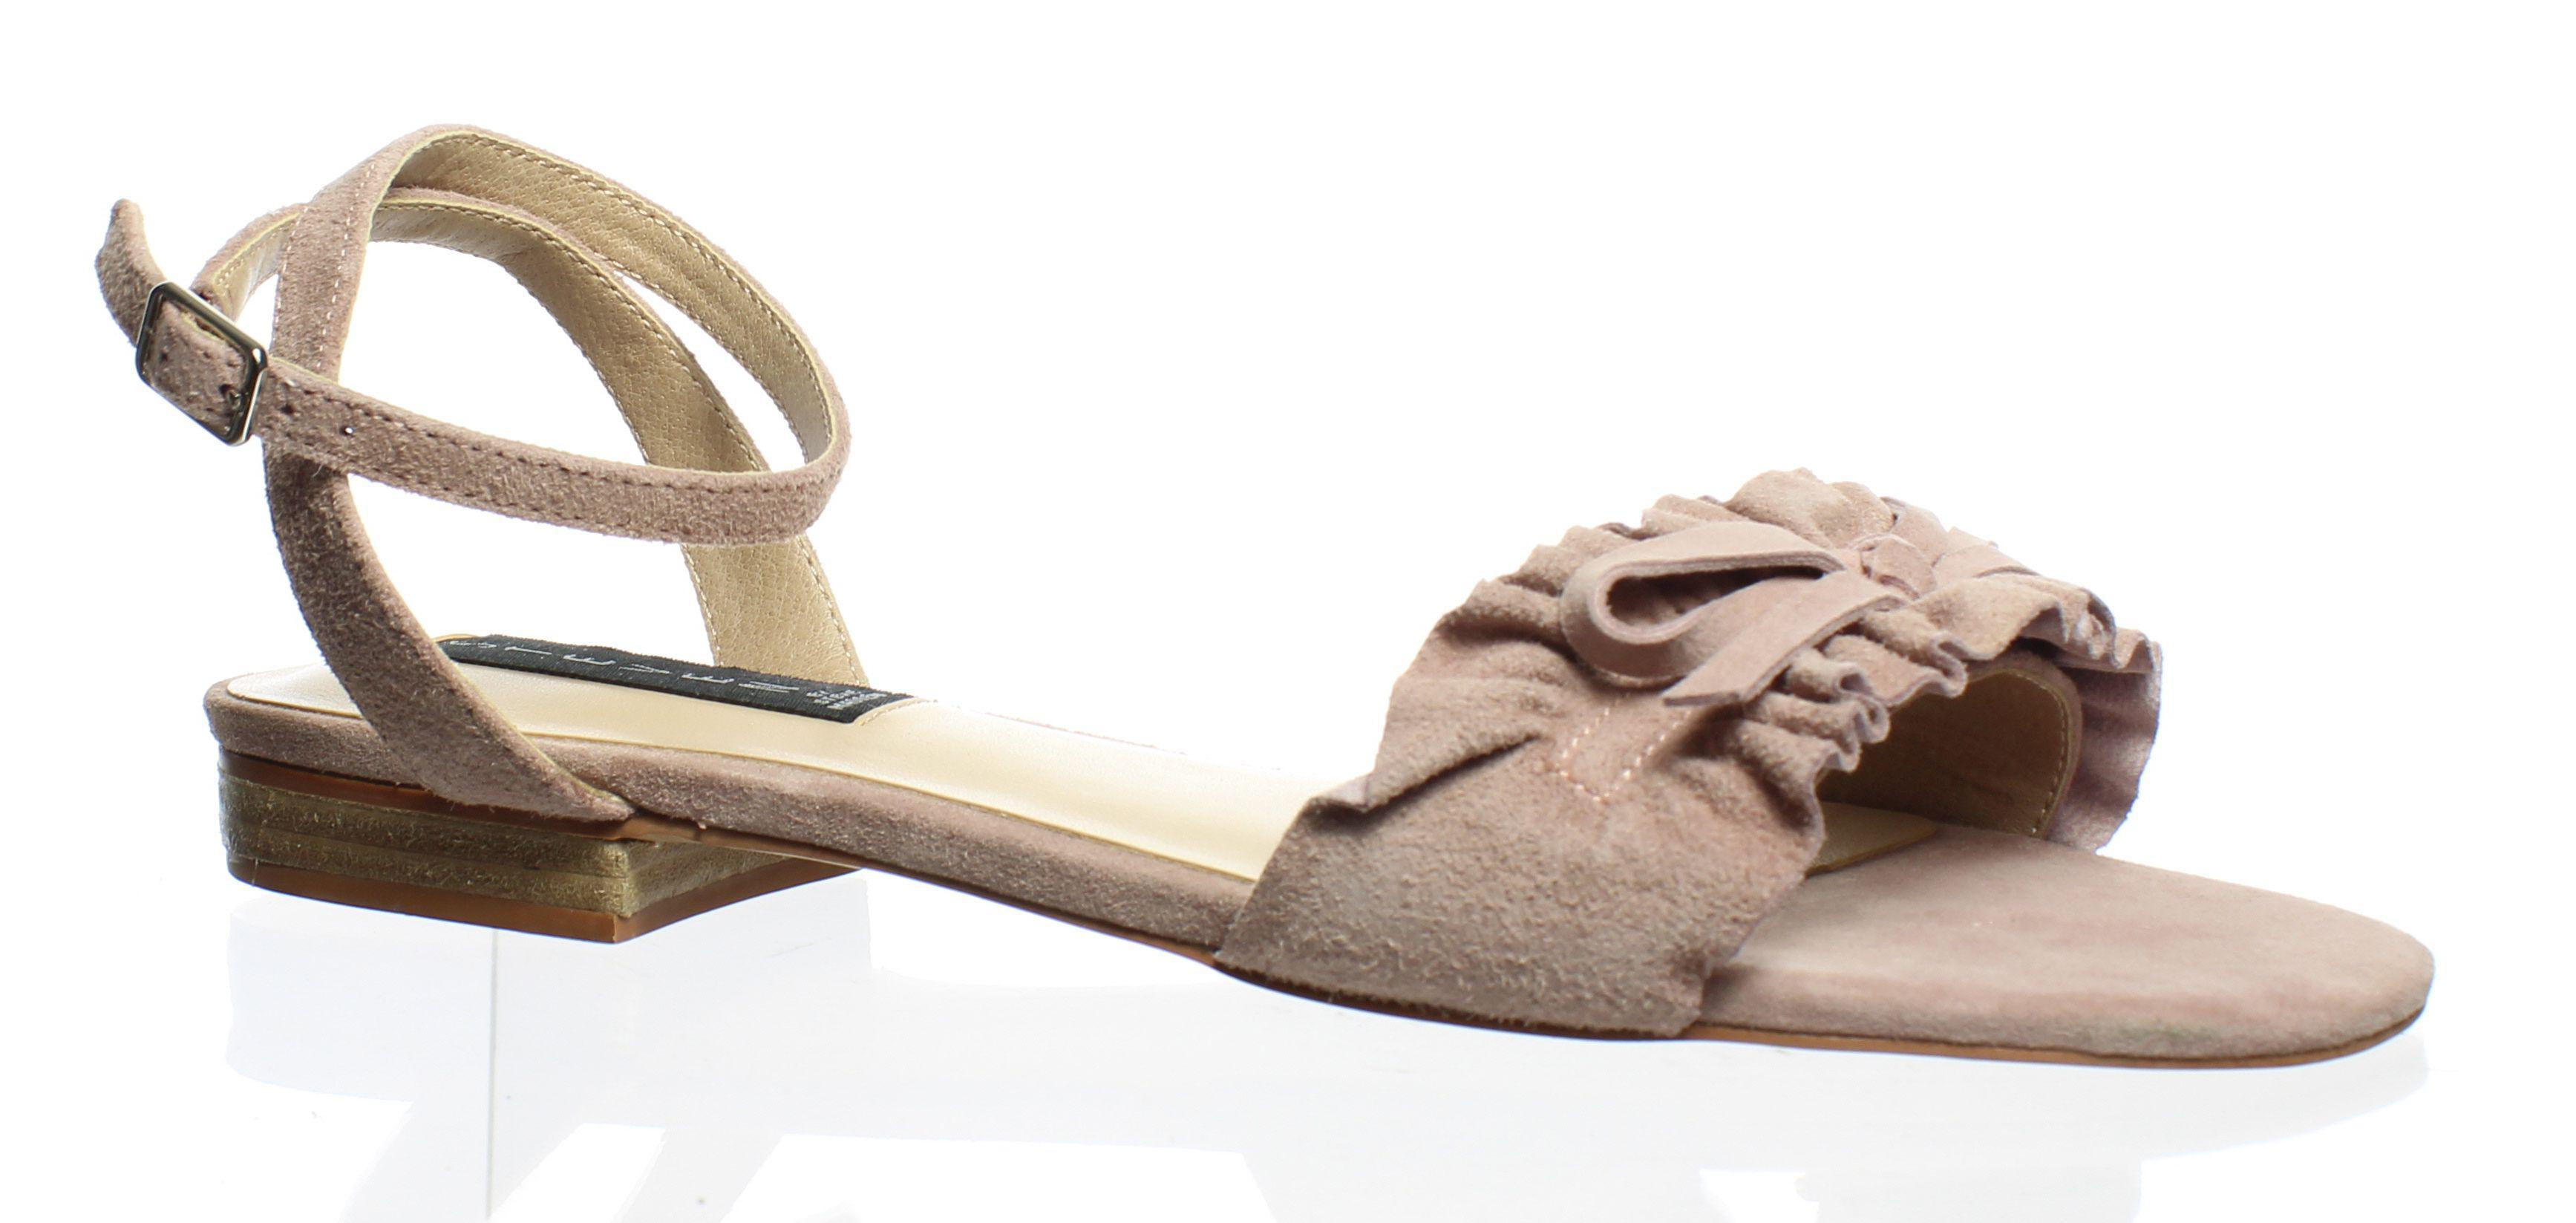 aa9ee81743a Lyst - Steve Madden Womens Cassiel Blush Suede Ankle Strap Heels